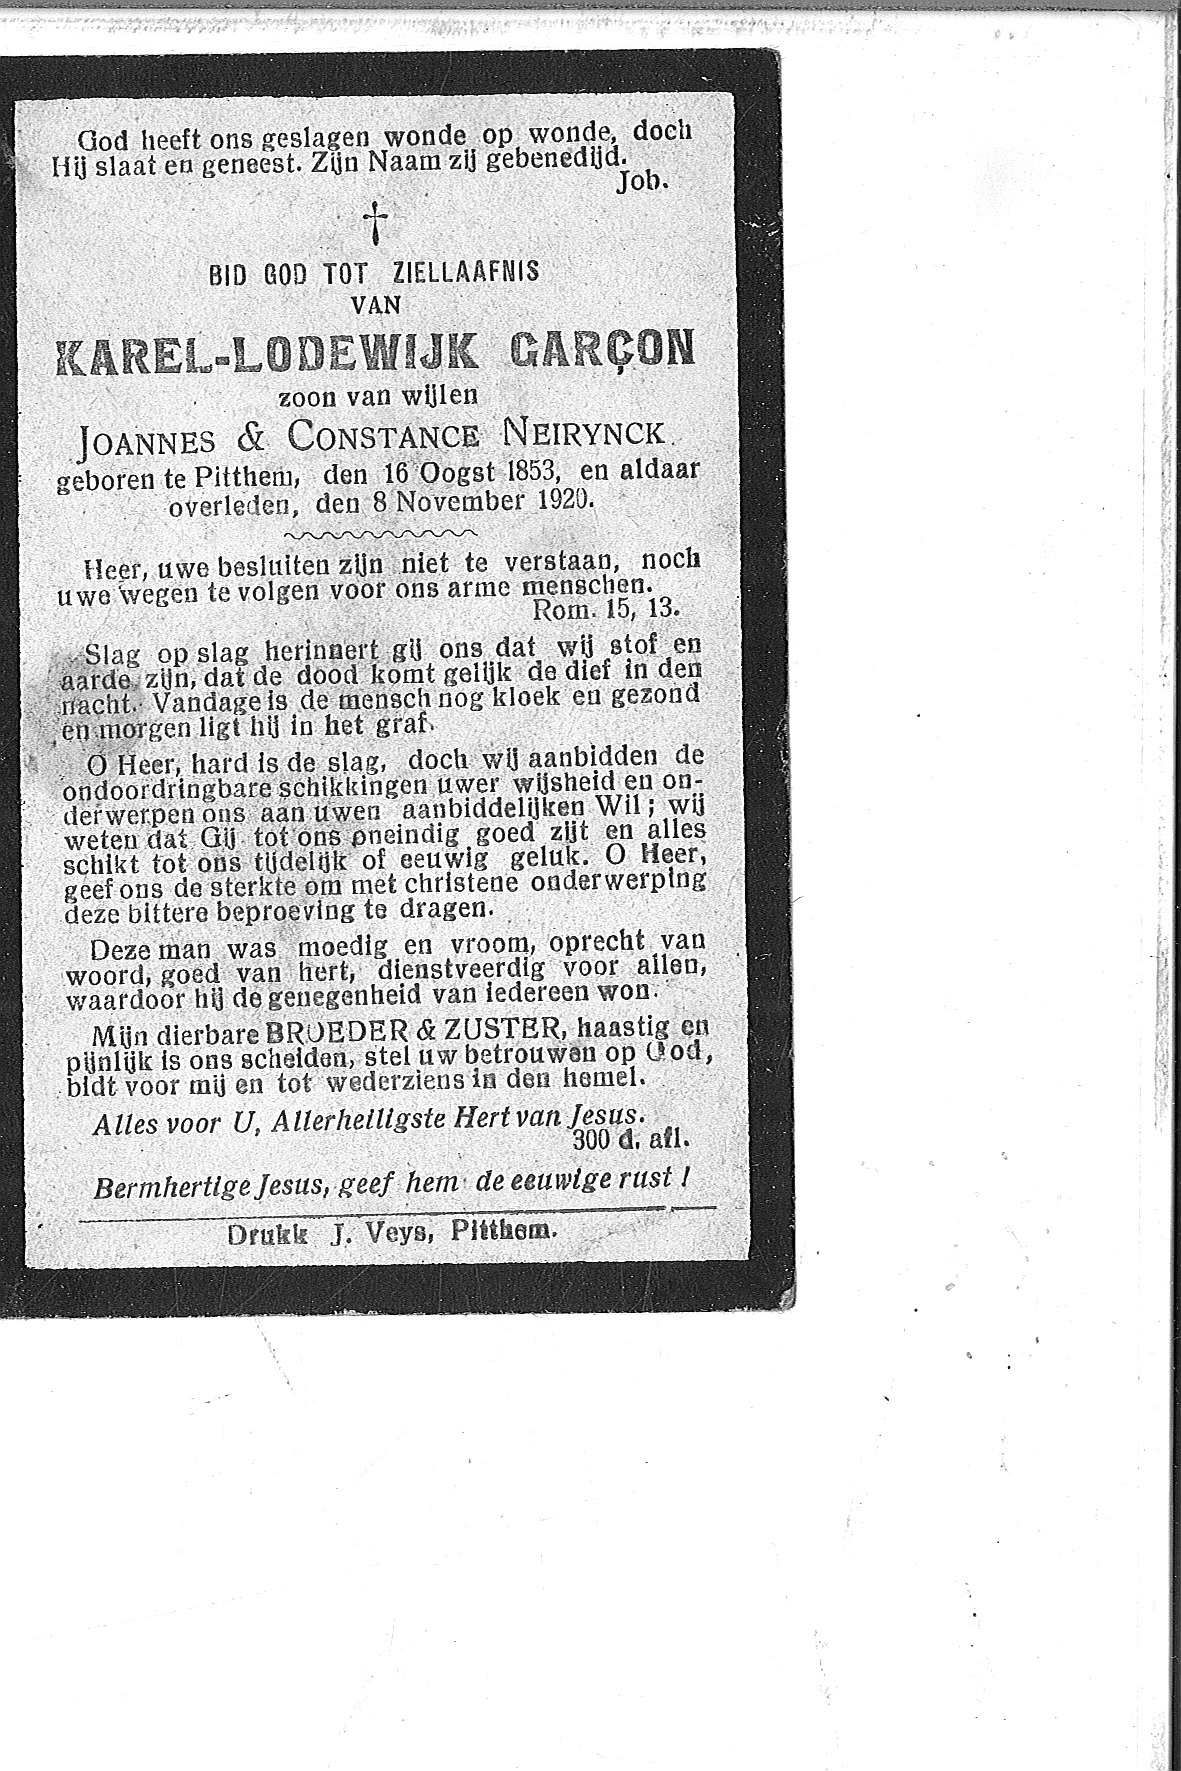 Karel-Lodewijk(1920).jpg